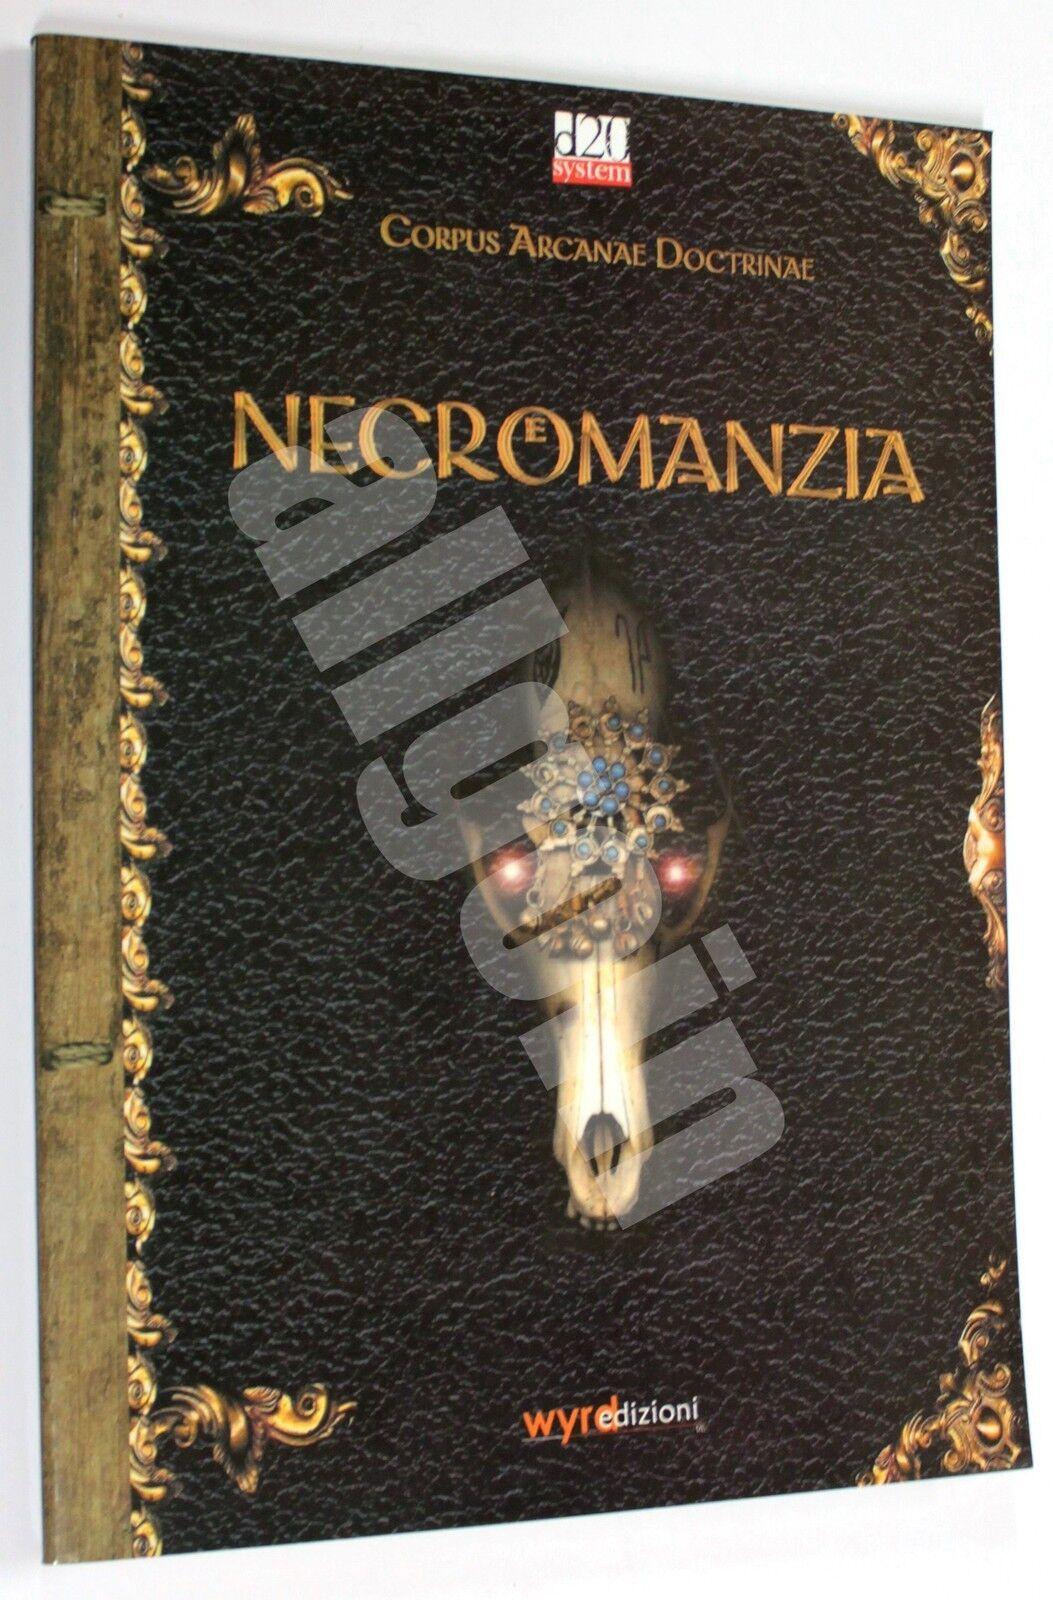 Dungeons & Dragons CORPUS ARCANAE DOCTRINAE NECROMANZIA 2003 Wyrd D&D 3.5 d20